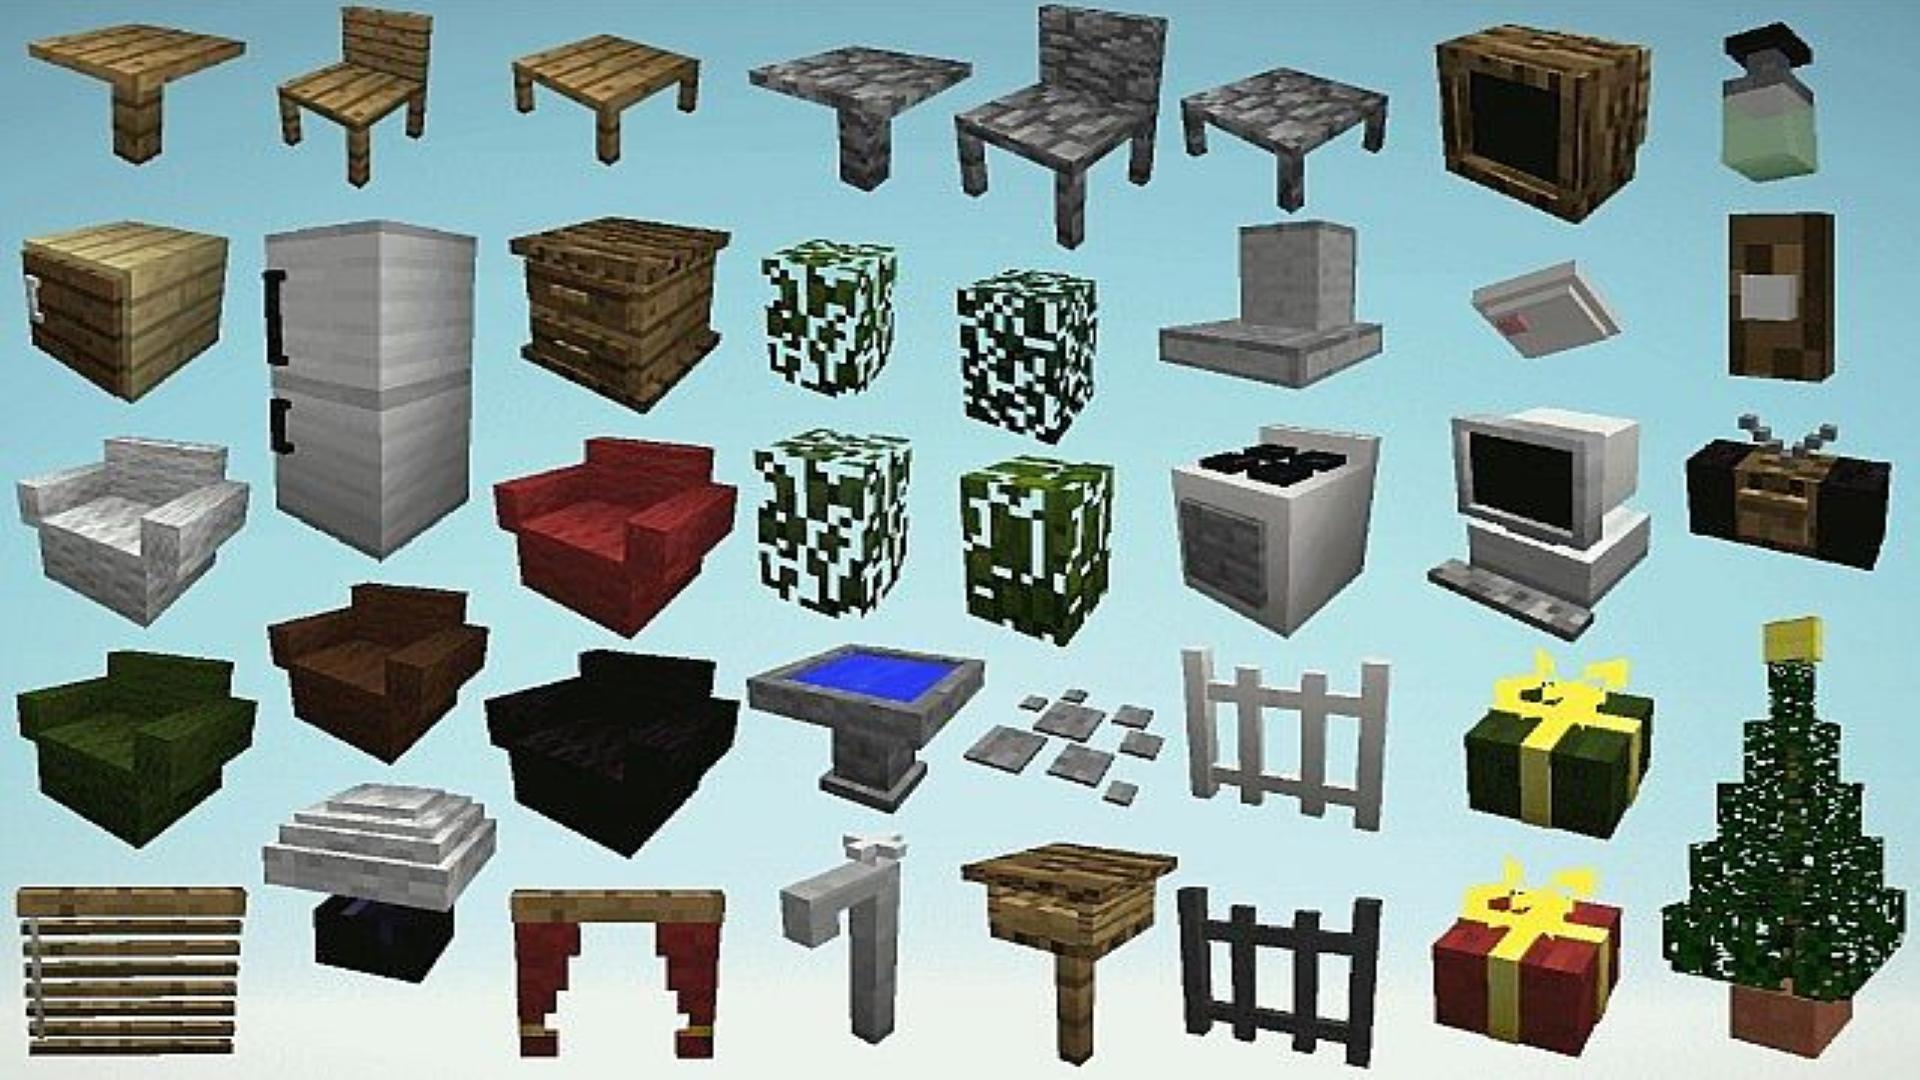 моды для майнкрафт 1.10.2 на мебель #5